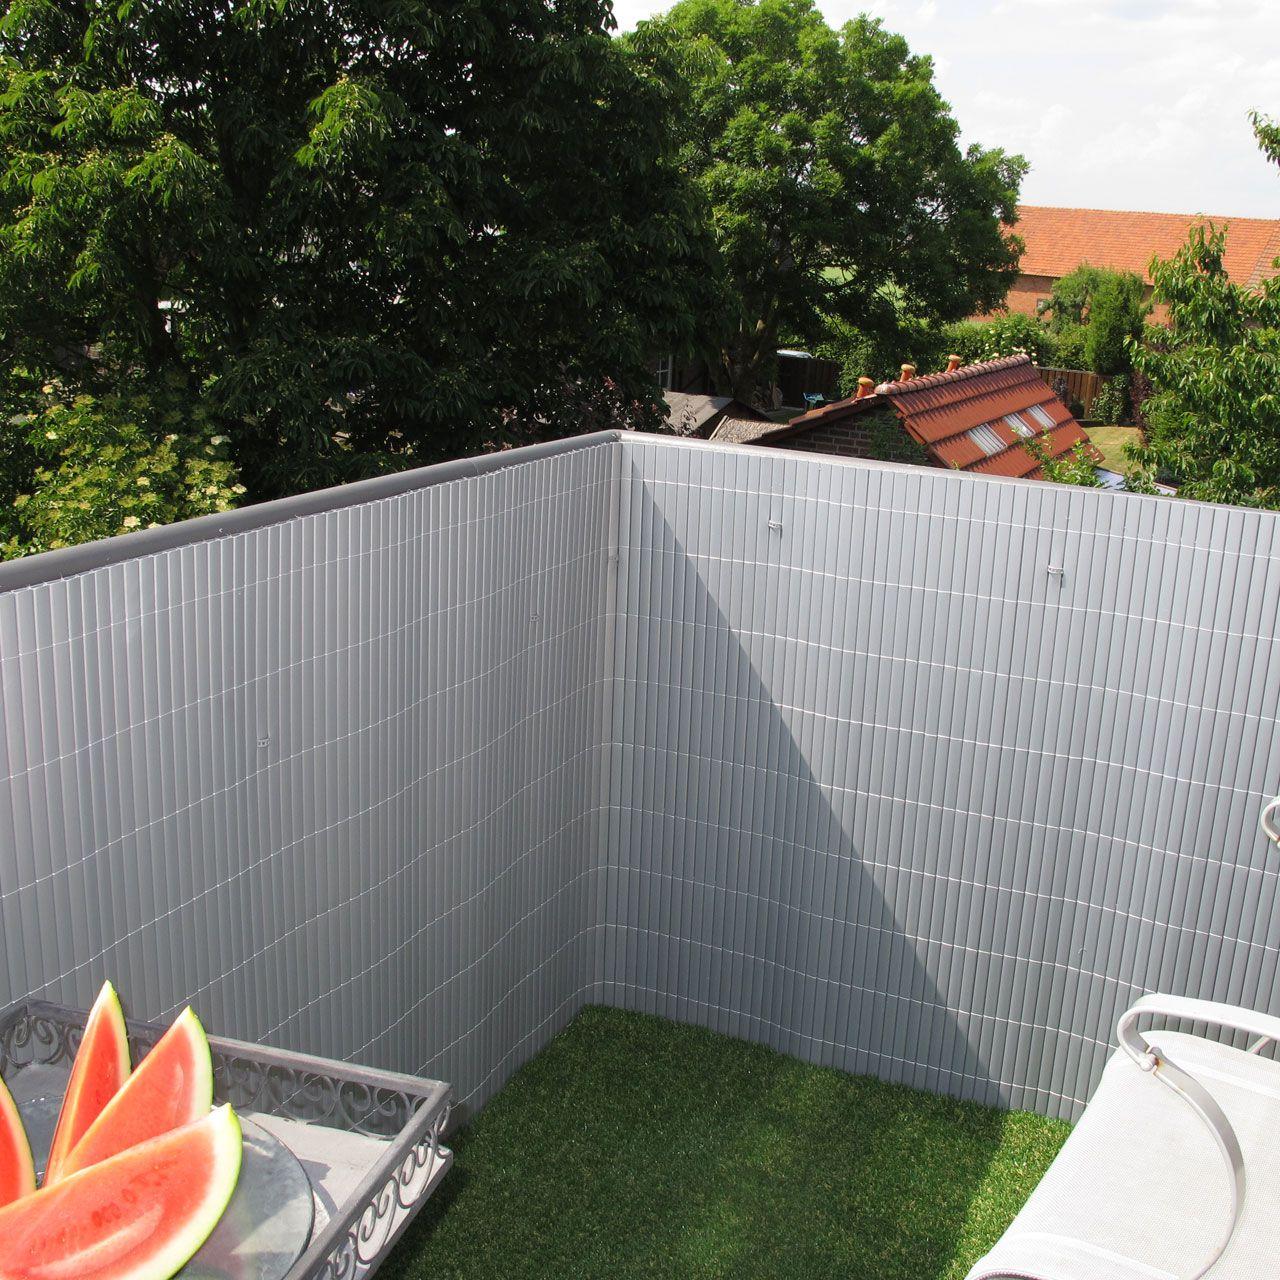 Sichtschutzzaun PVC Kunststoff Rügen aluminium